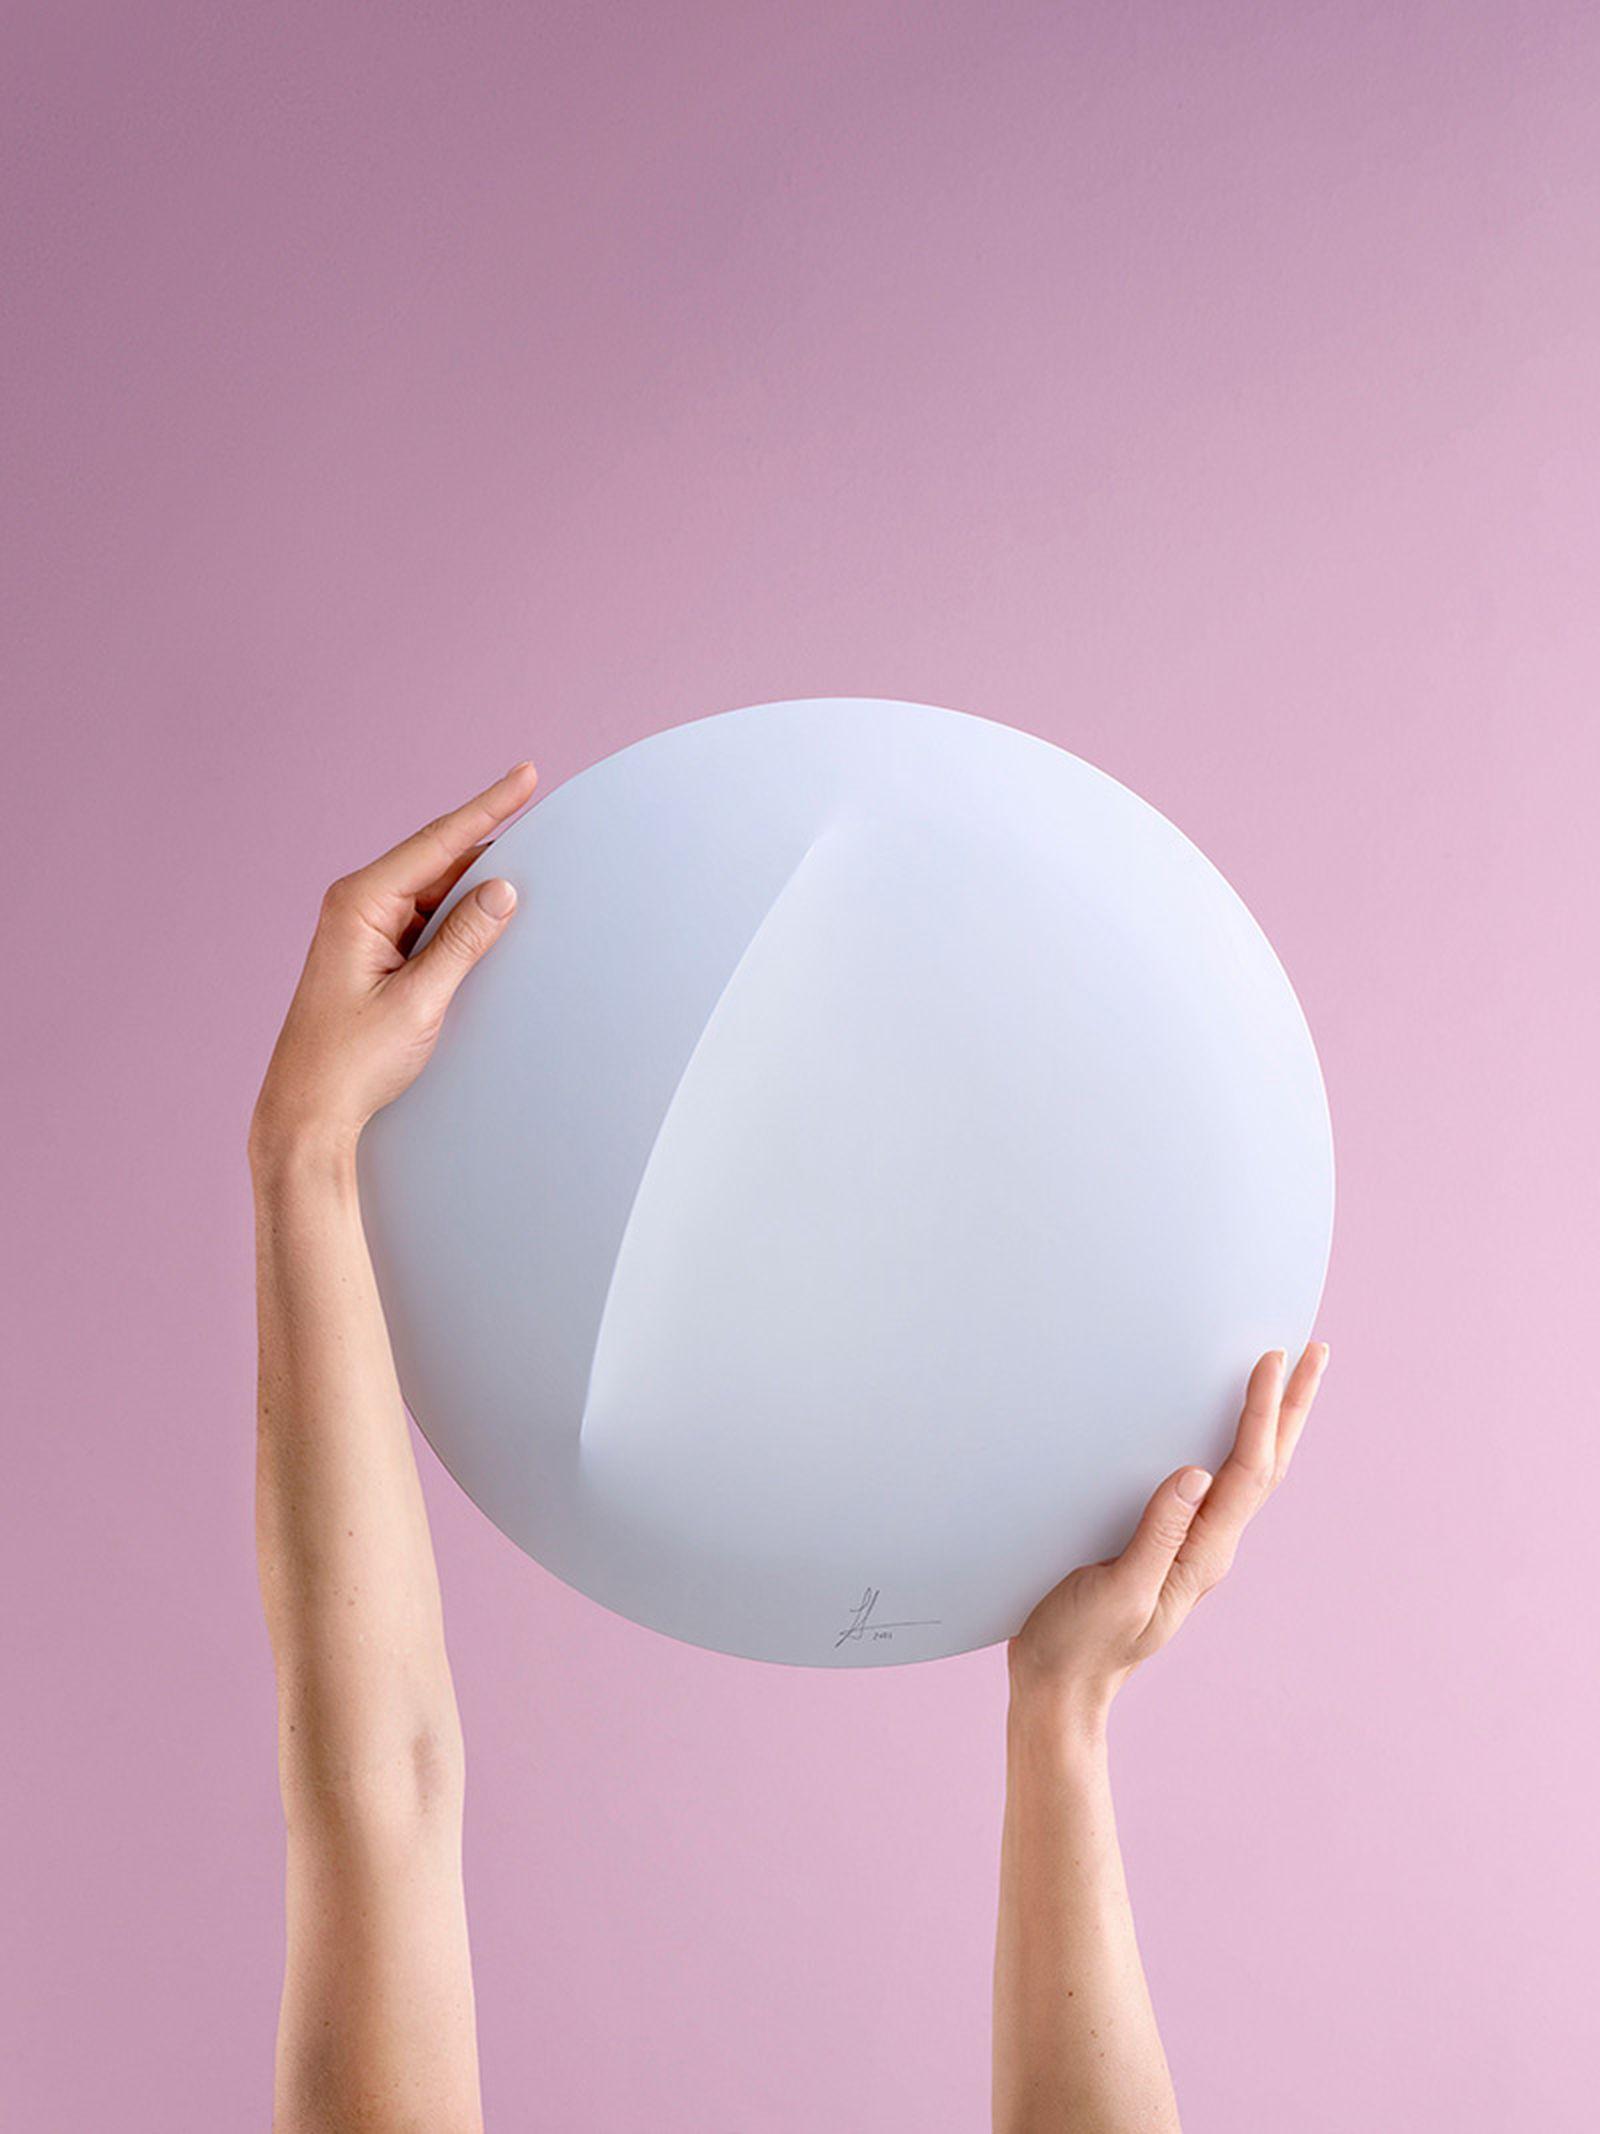 IKEA ART EVENT 2021 LED wall lamp by Sabine Marcelis